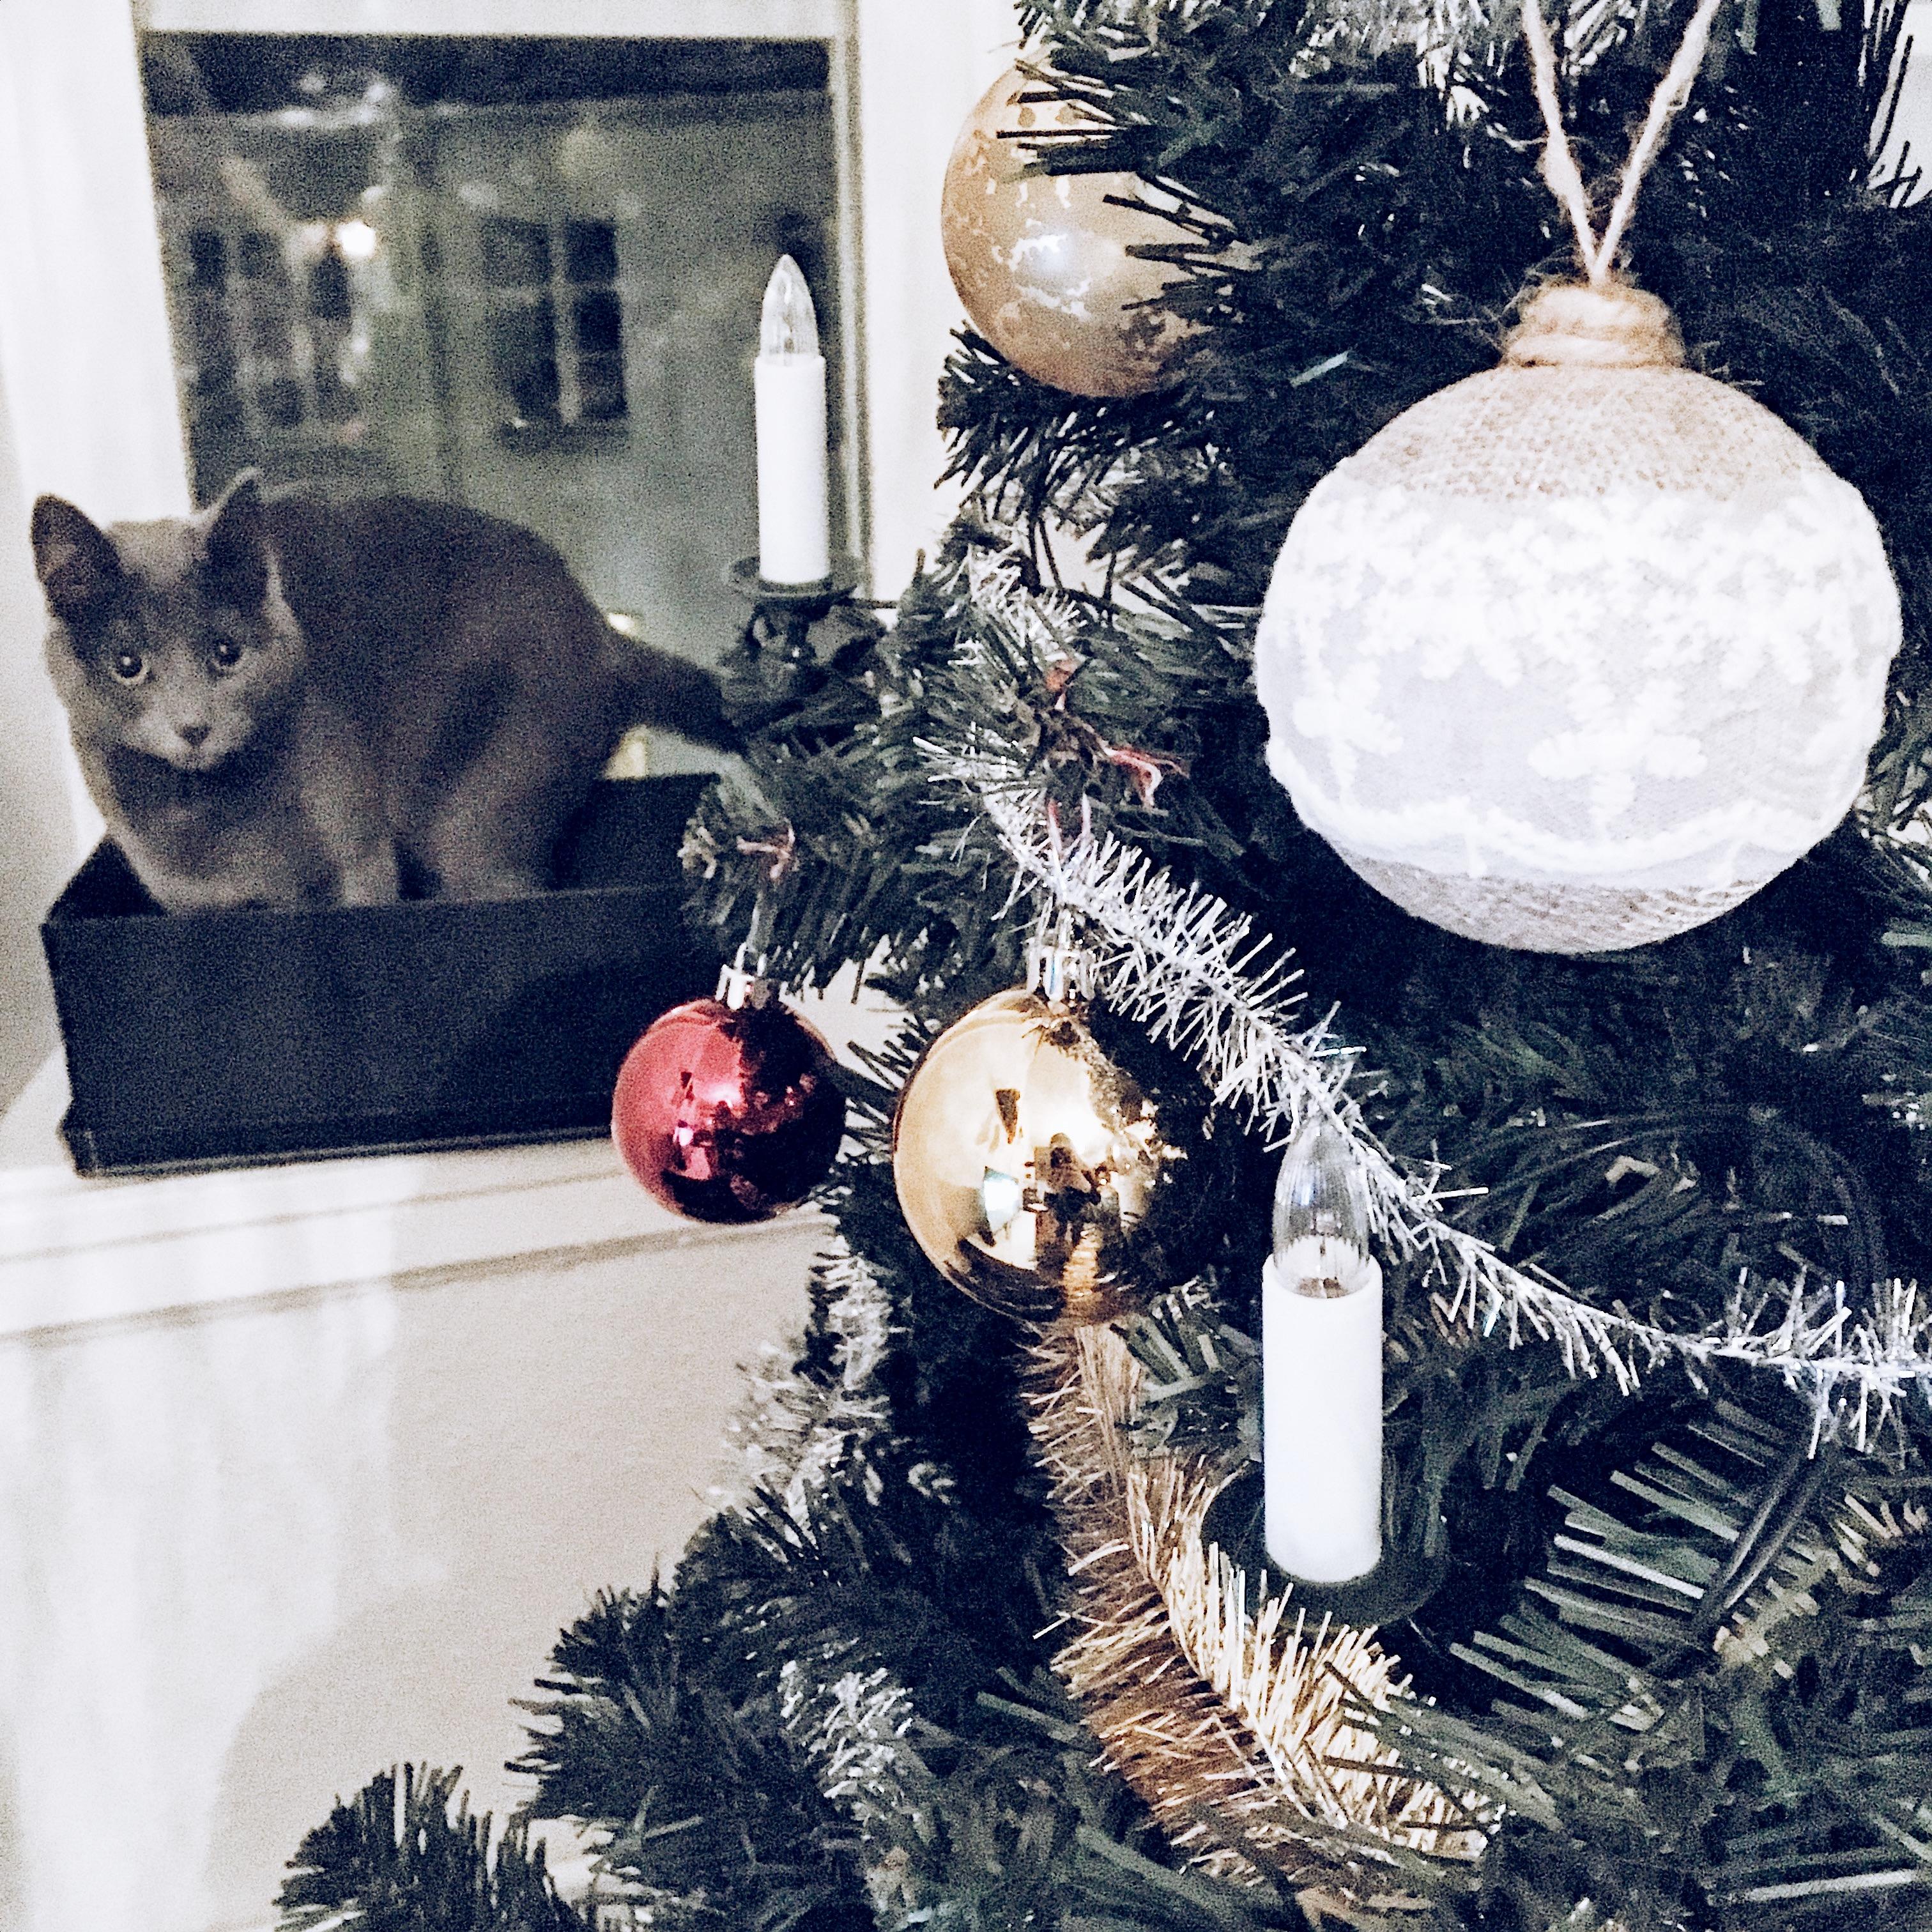 christmas-decorations-cat